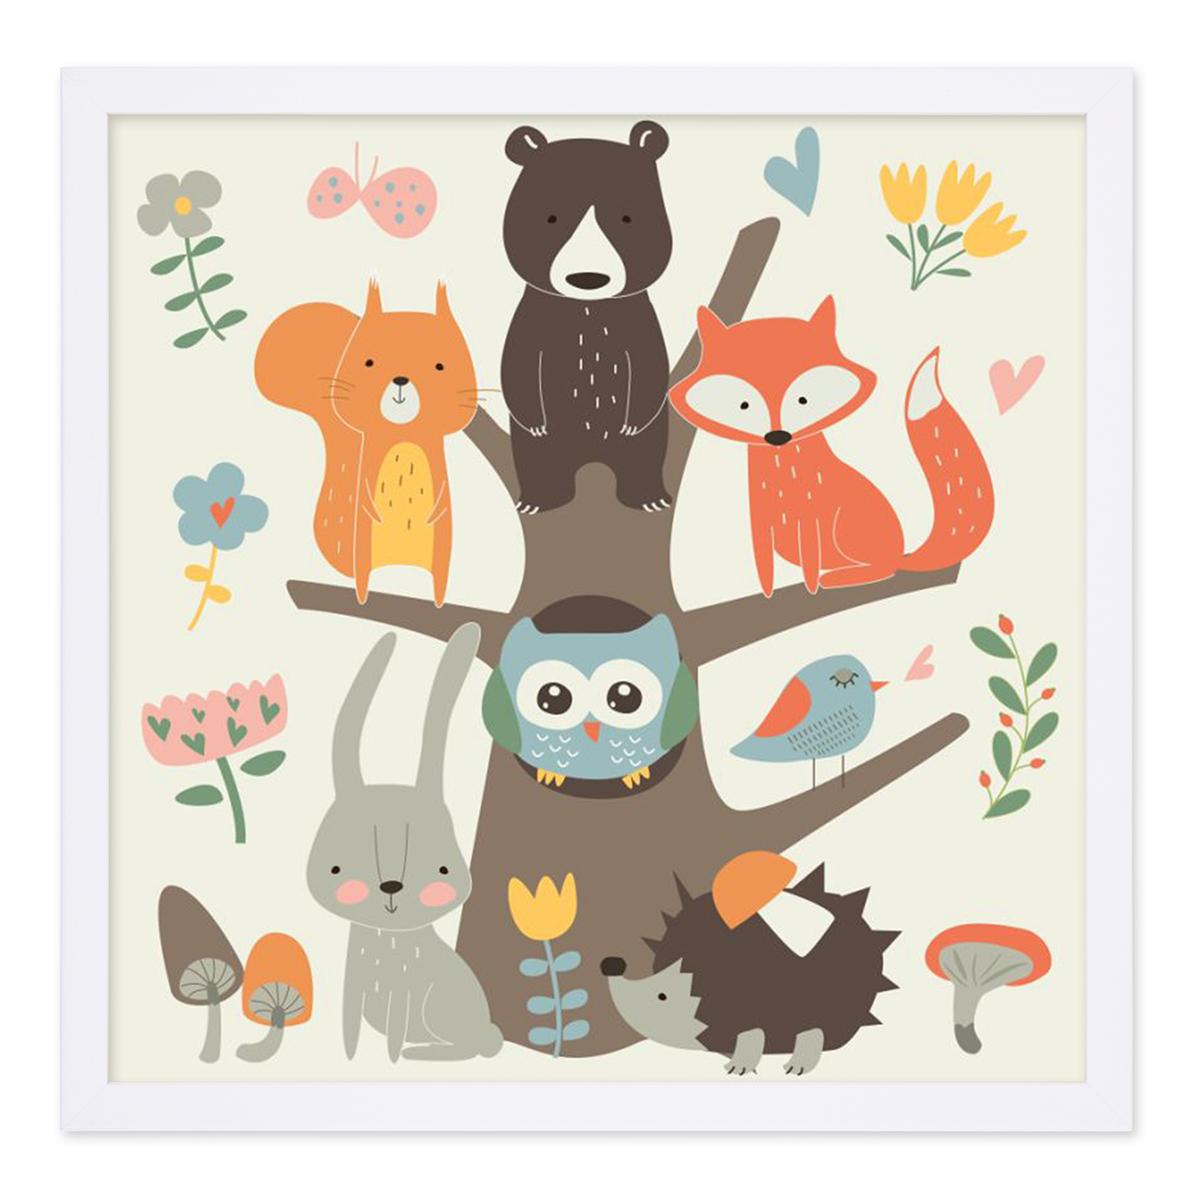 Kinder Poster Waldtiere 30x30 Cm Kinderzimmer Bunt Tiere Natur